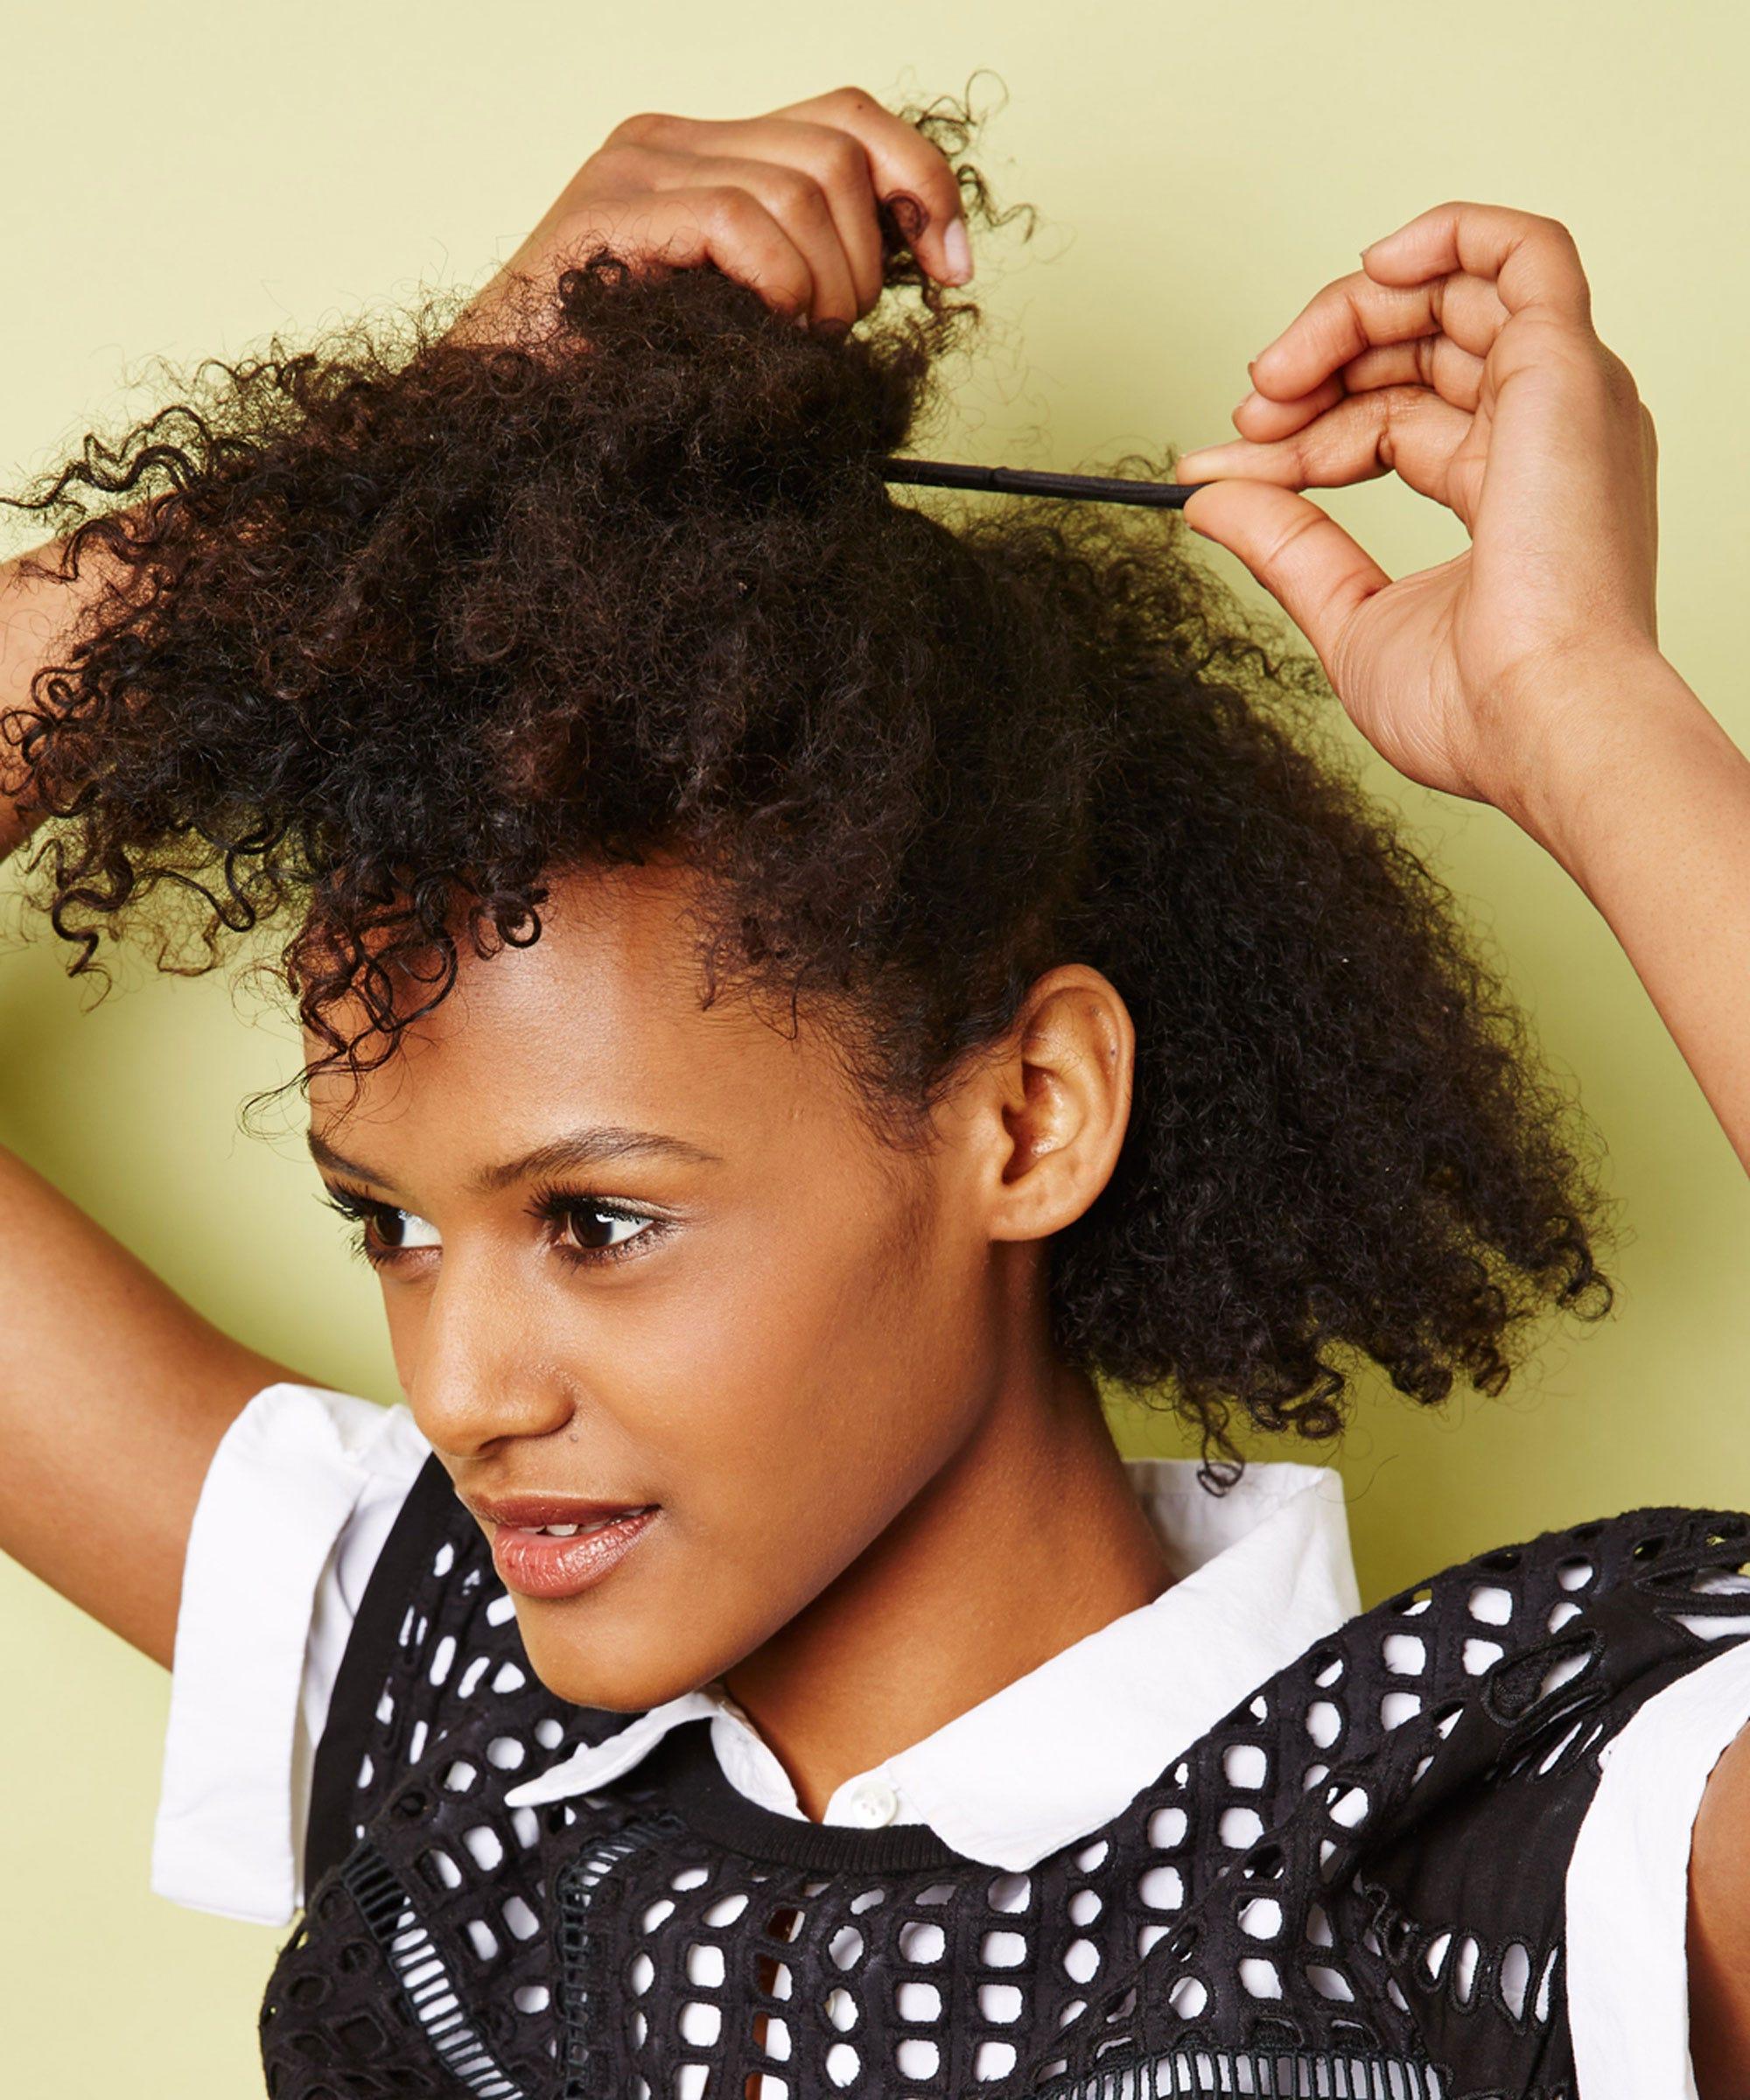 Wondrous Easy Natural Hairstyles For Transitioning Hair Short Hairstyles For Black Women Fulllsitofus